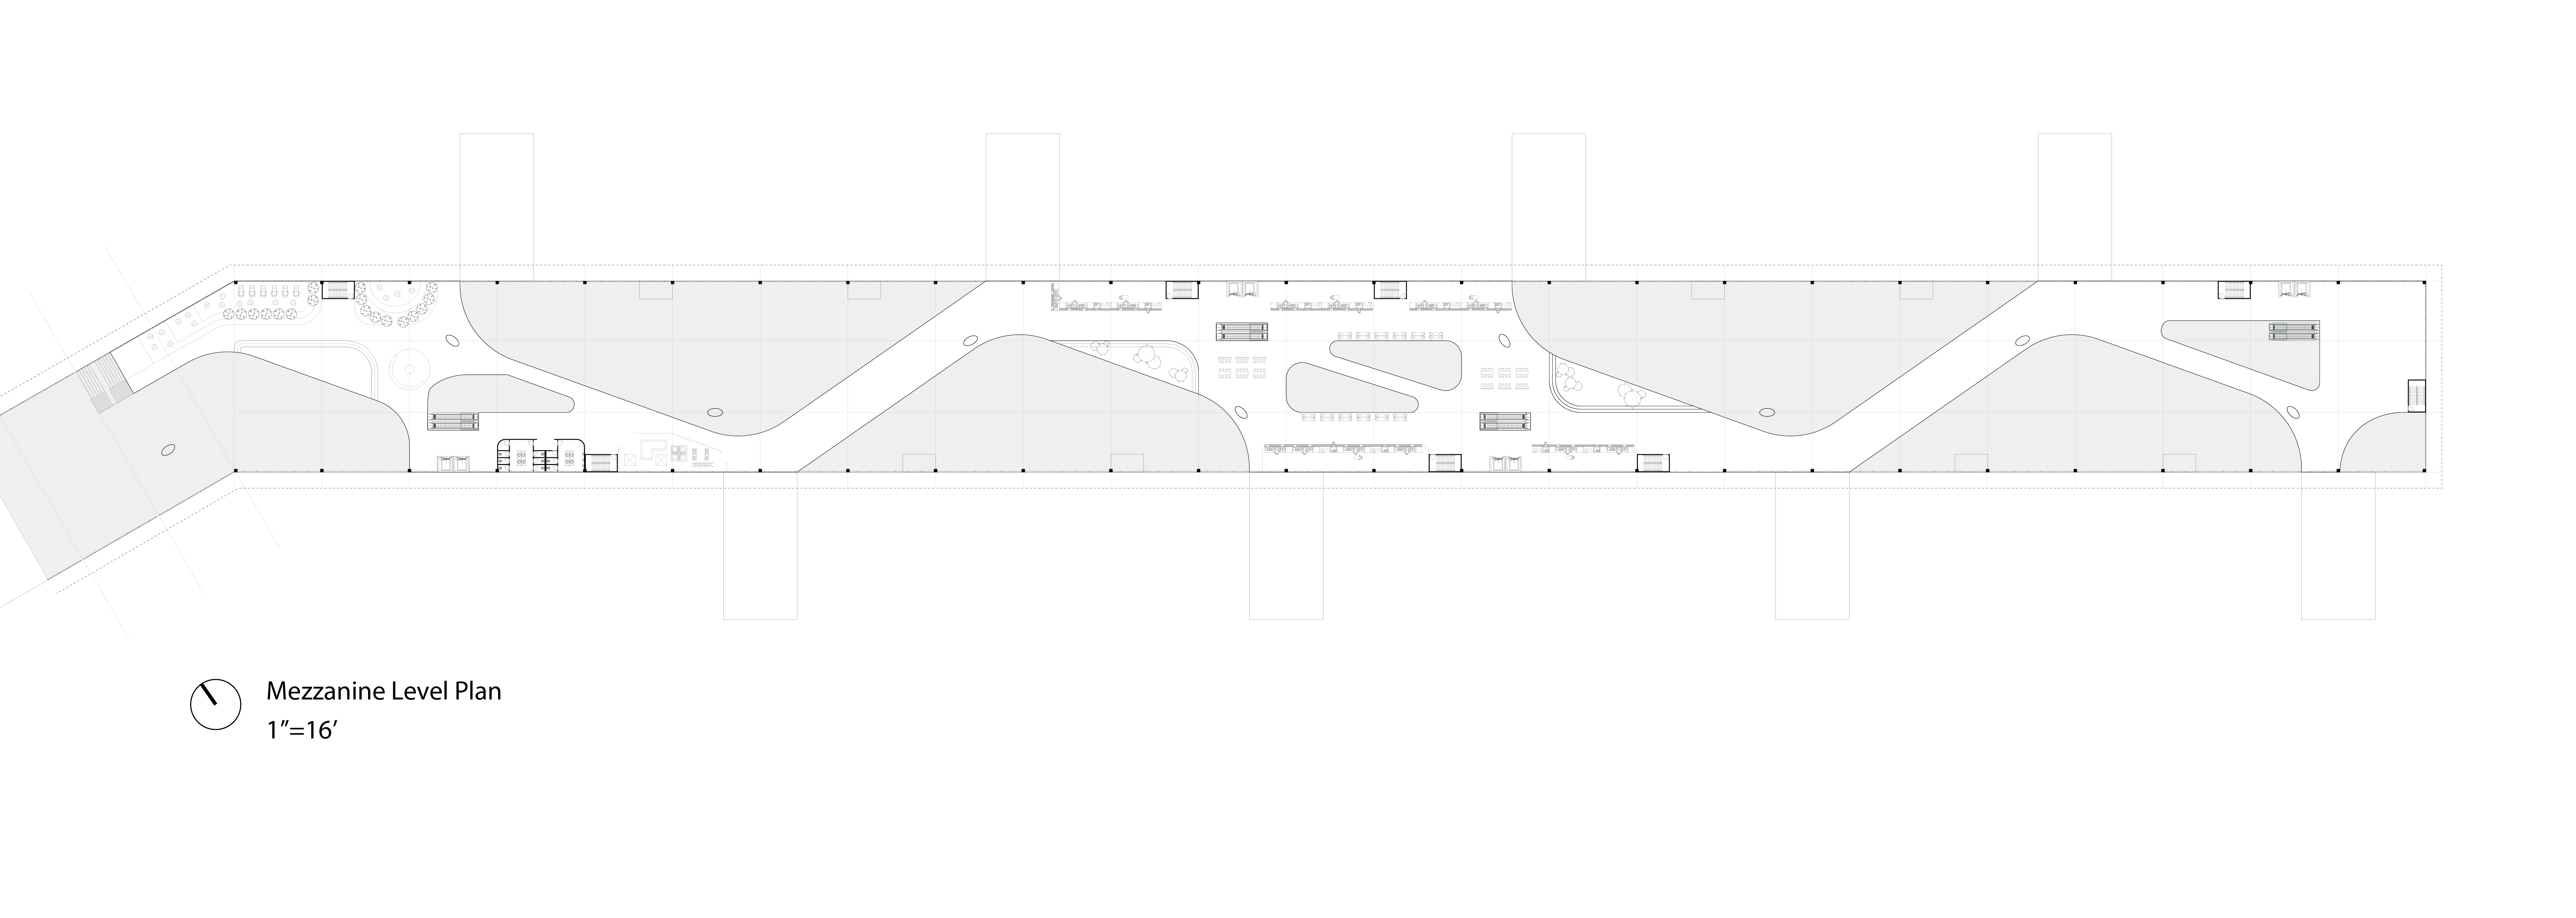 Mezzanine Level Plan